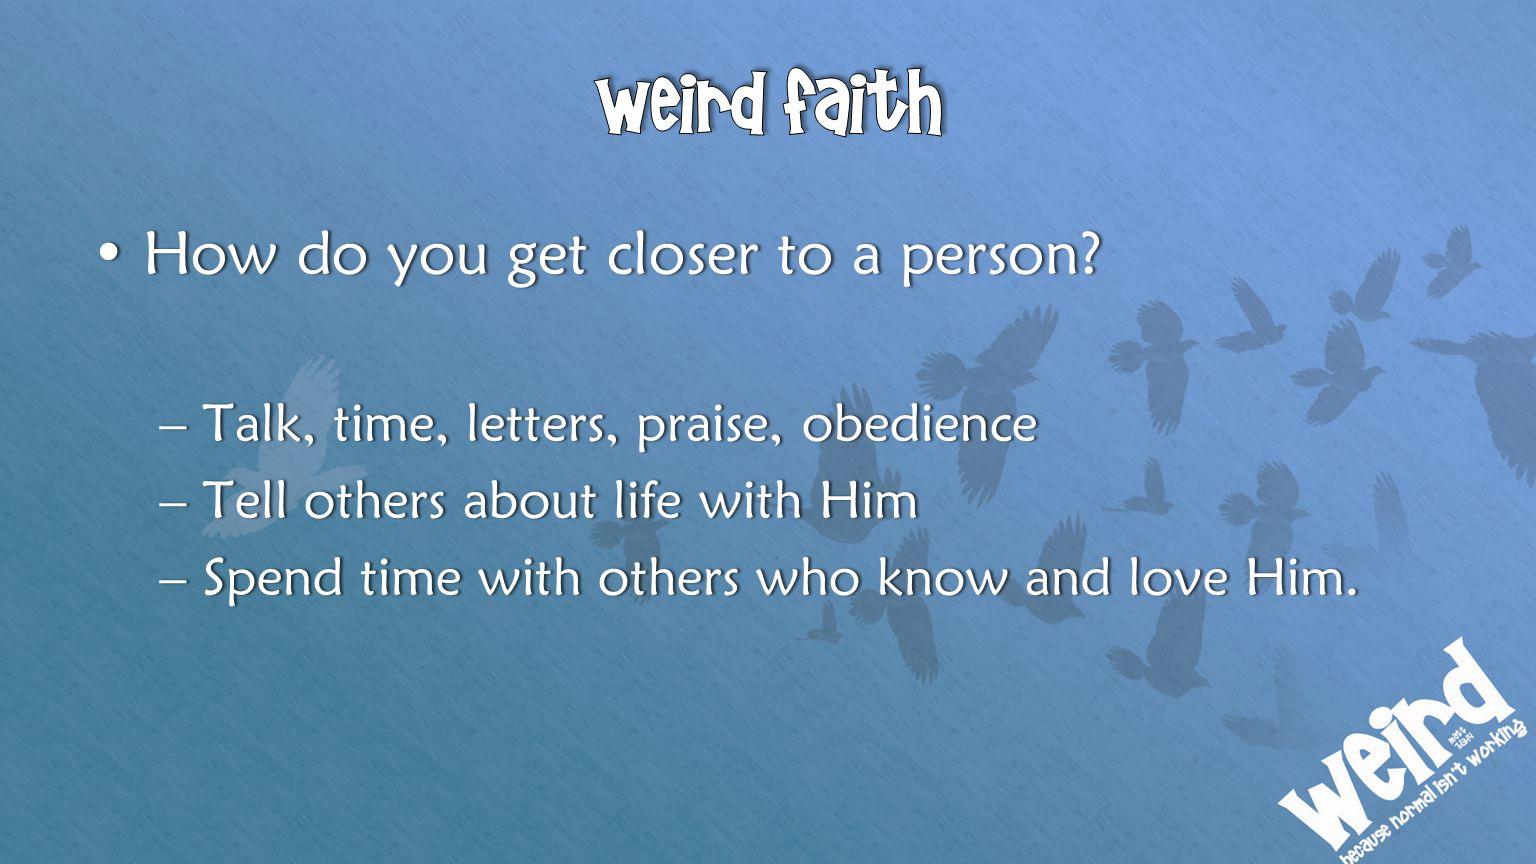 Weird faith How do you get closer to a person